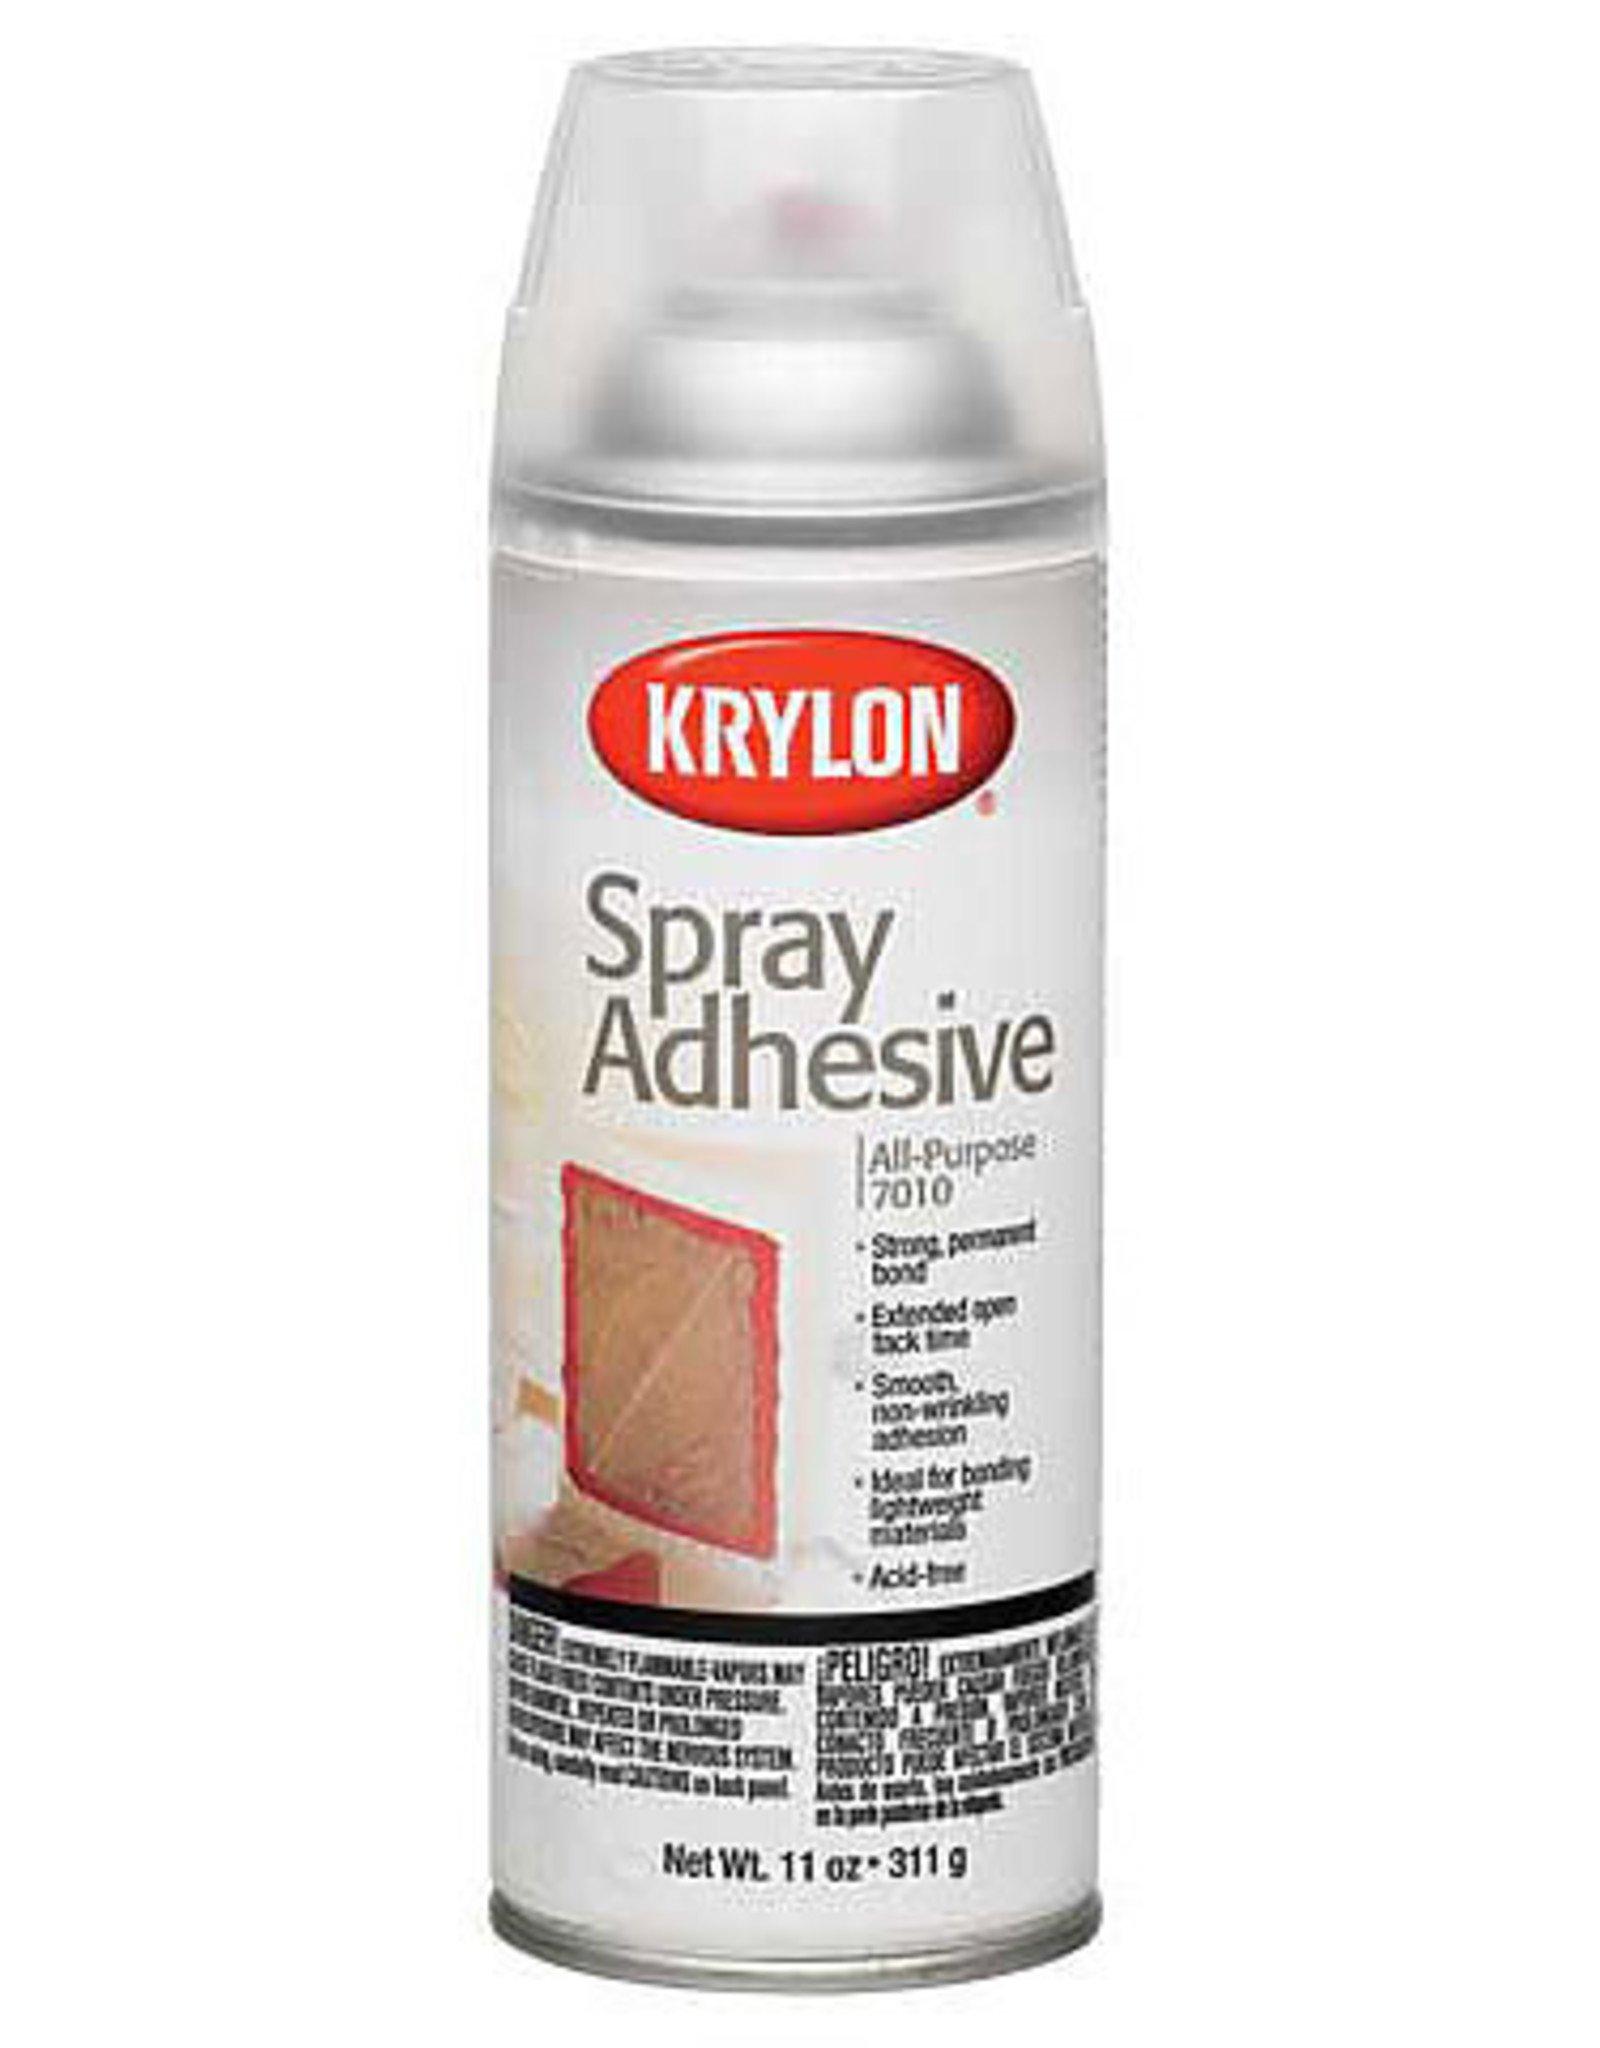 Krylon Spray Adhesive 11 oz